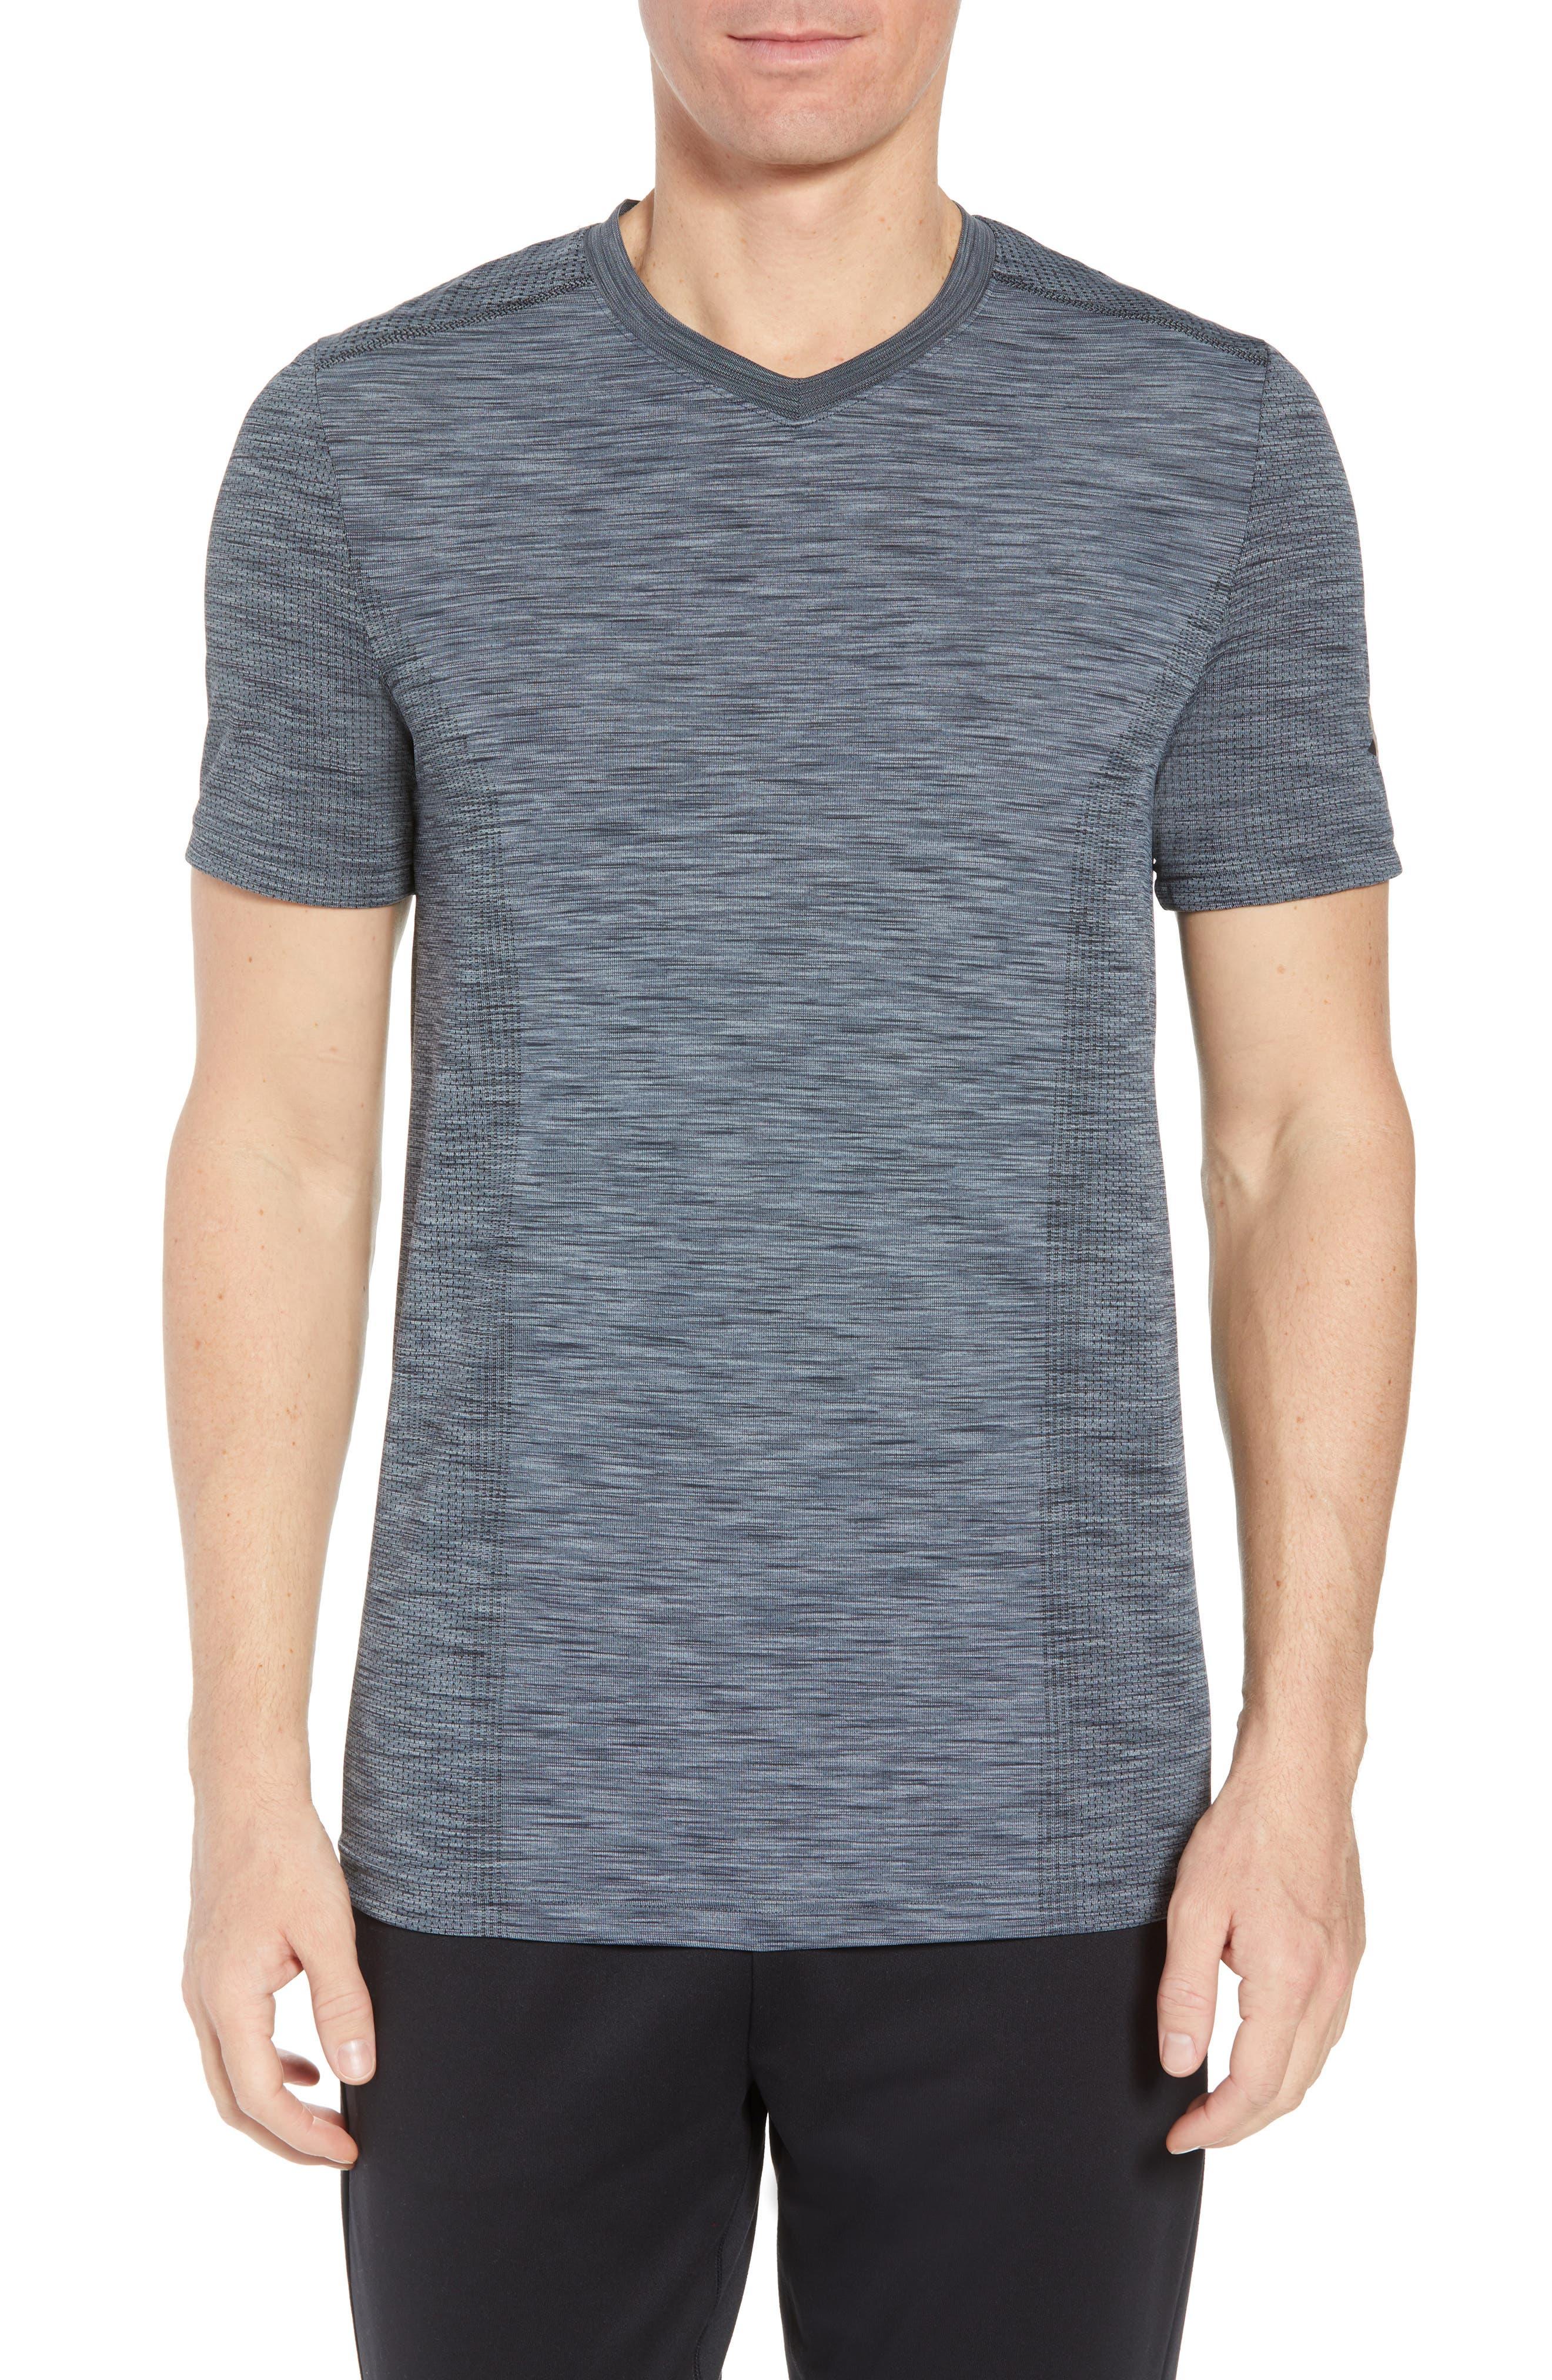 Regular Fit Threadborne T-Shirt,                             Main thumbnail 1, color,                             GRAPHITE/ BLACK